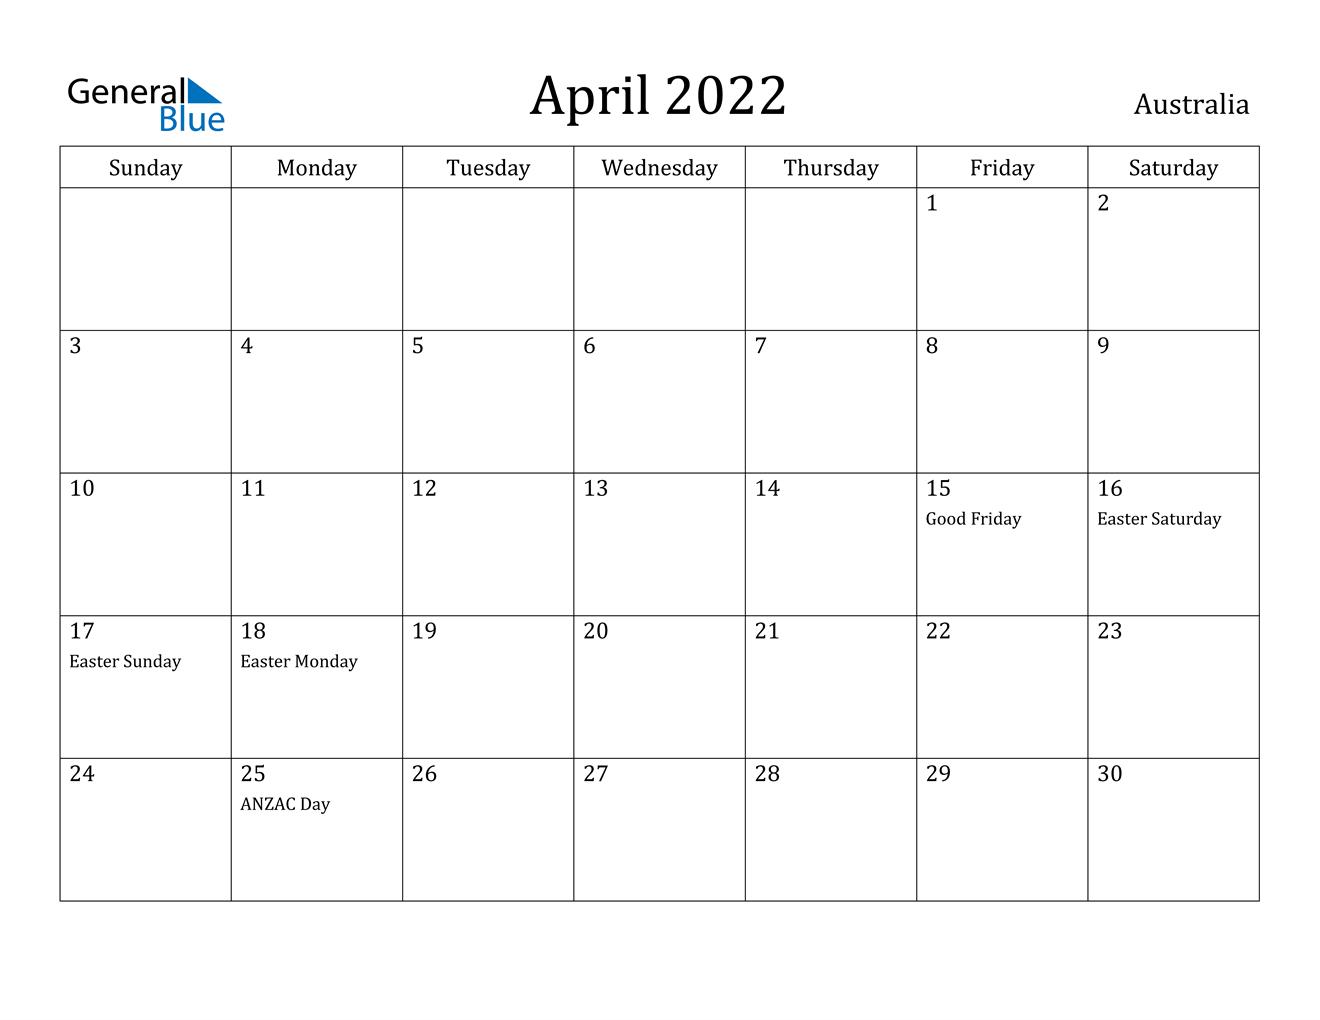 April 2022 Calendar - Australia throughout April 2022 Printable Calendar Free